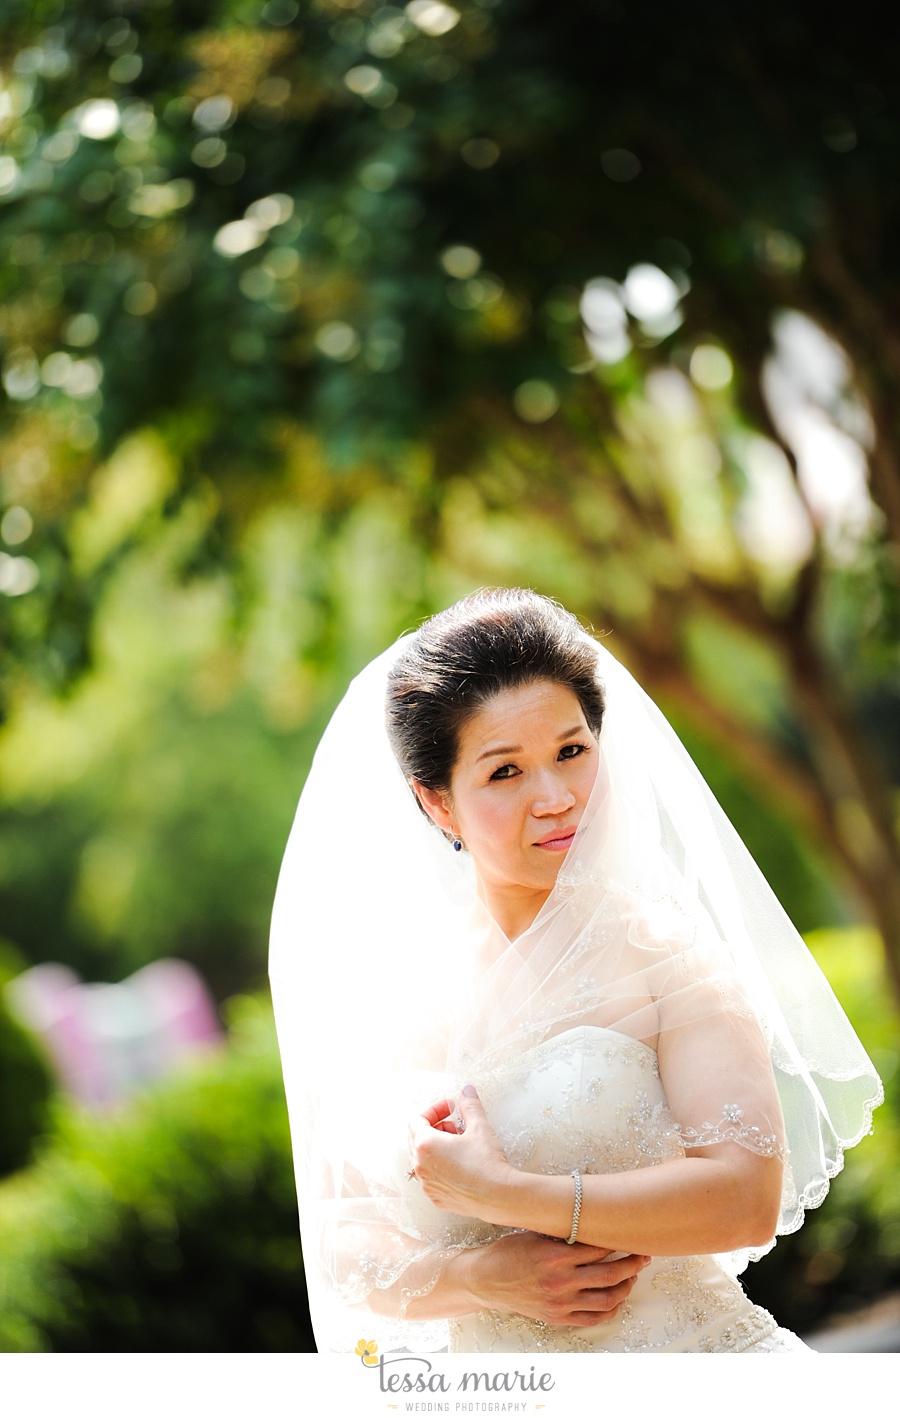 evergreen_resort_wedding_reception_stone_mountain_tessa_marie_weddings_0011